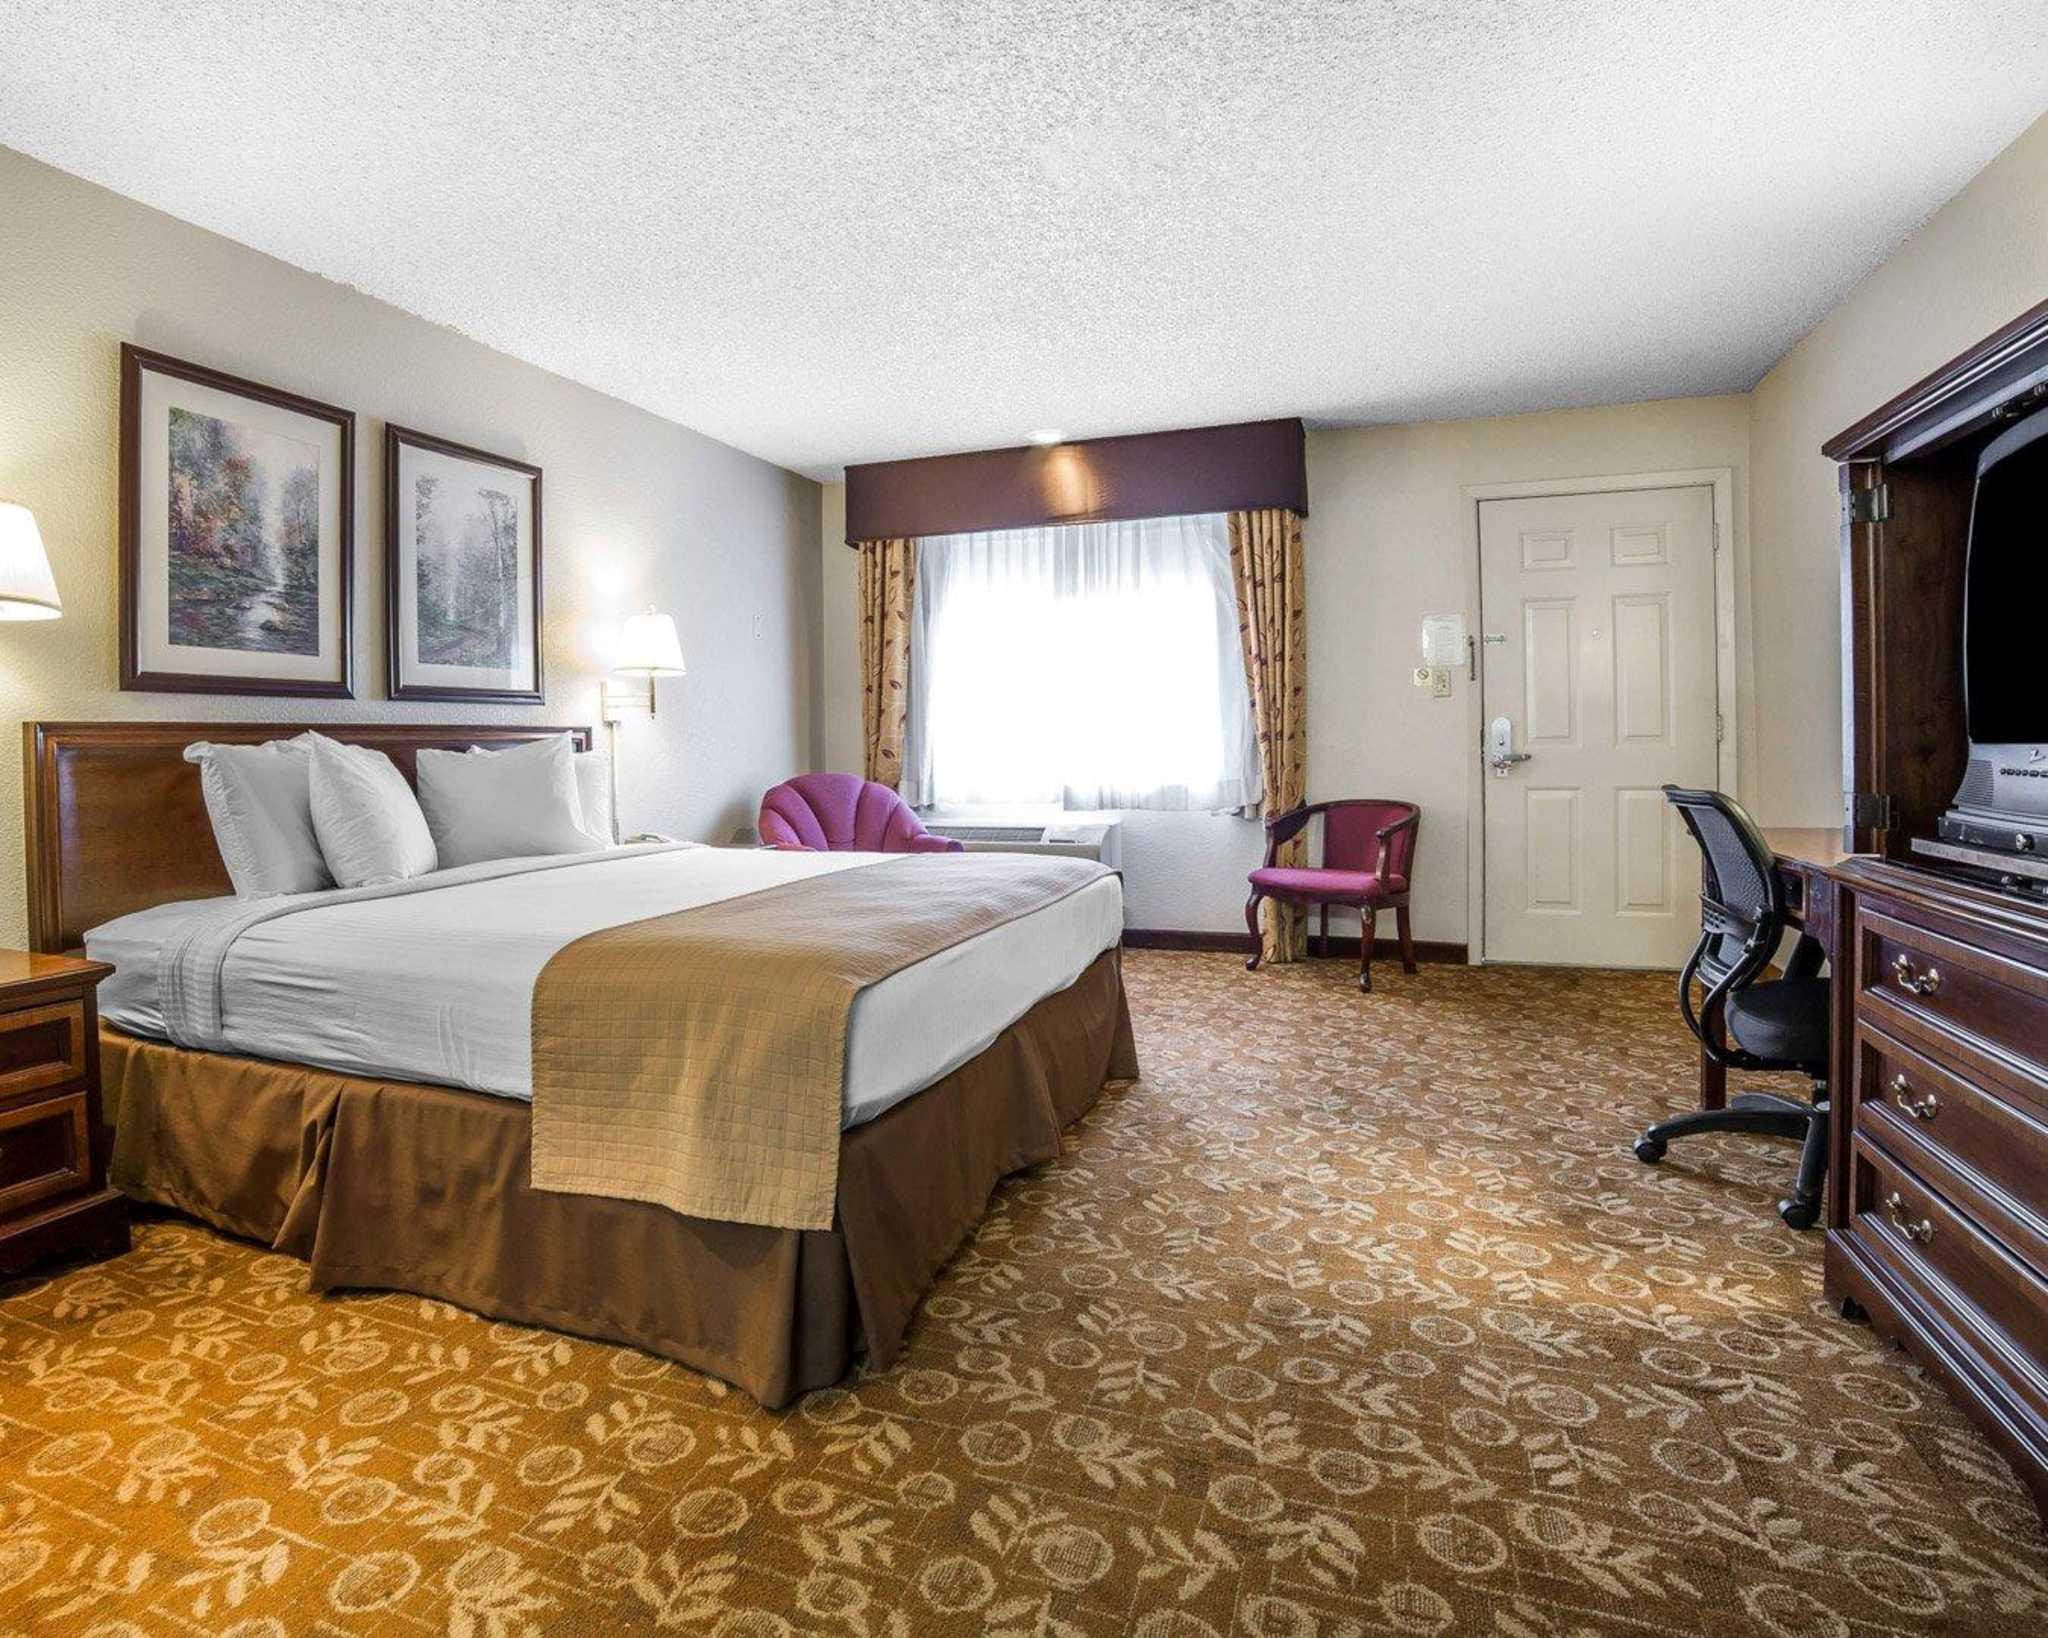 Quality Inn & Suites Minden US-395 image 25